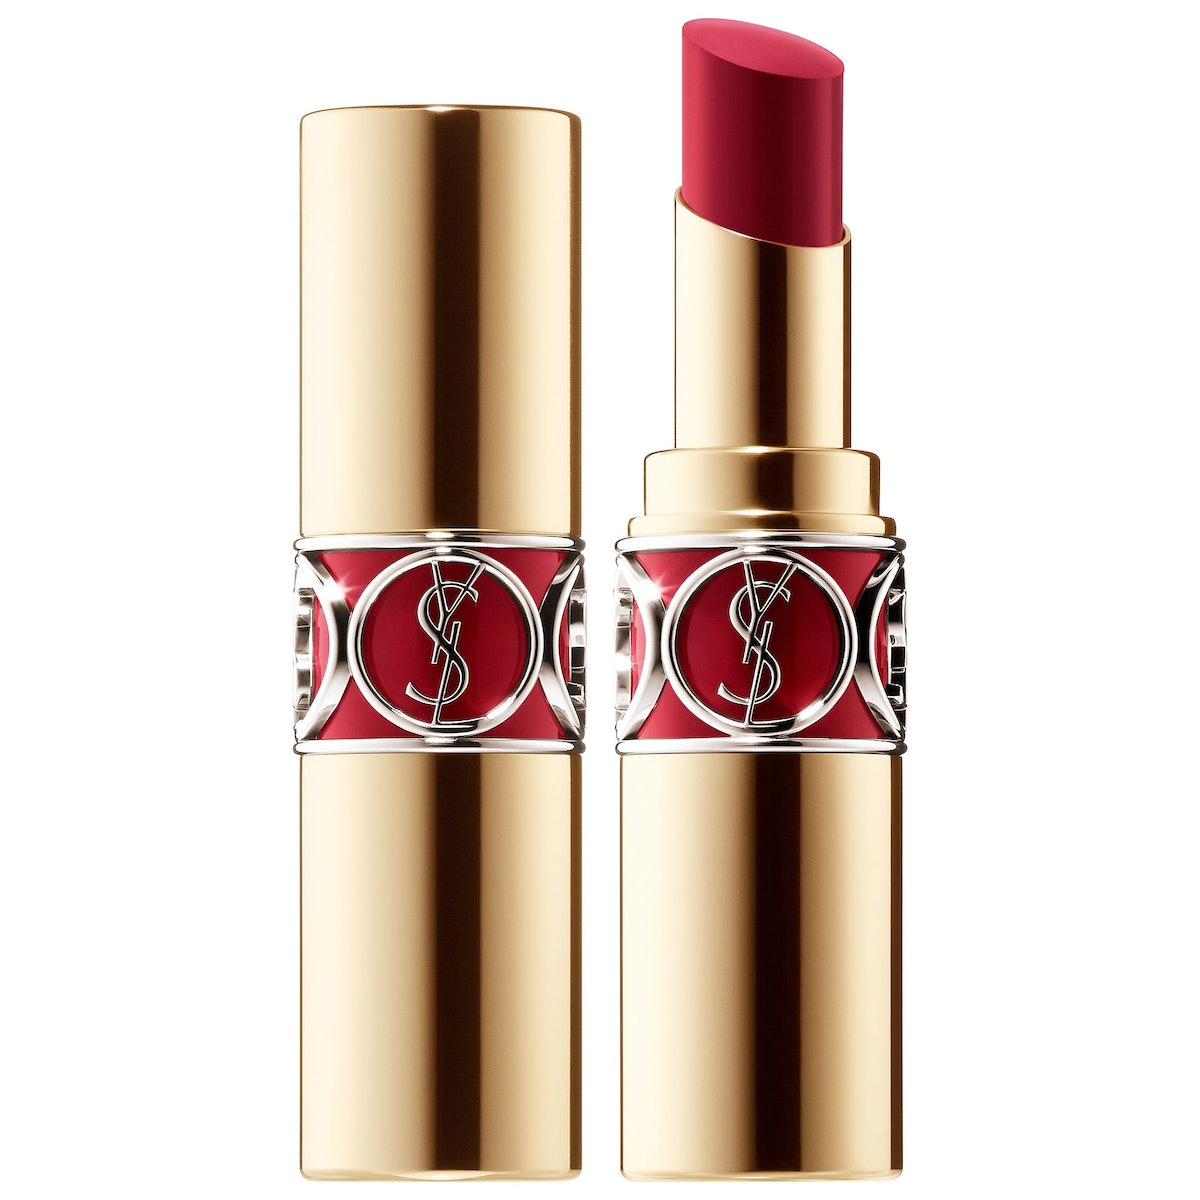 Rouge Volupté Shine Oil-In-Stick Lipstick In 84 Red Cassandre